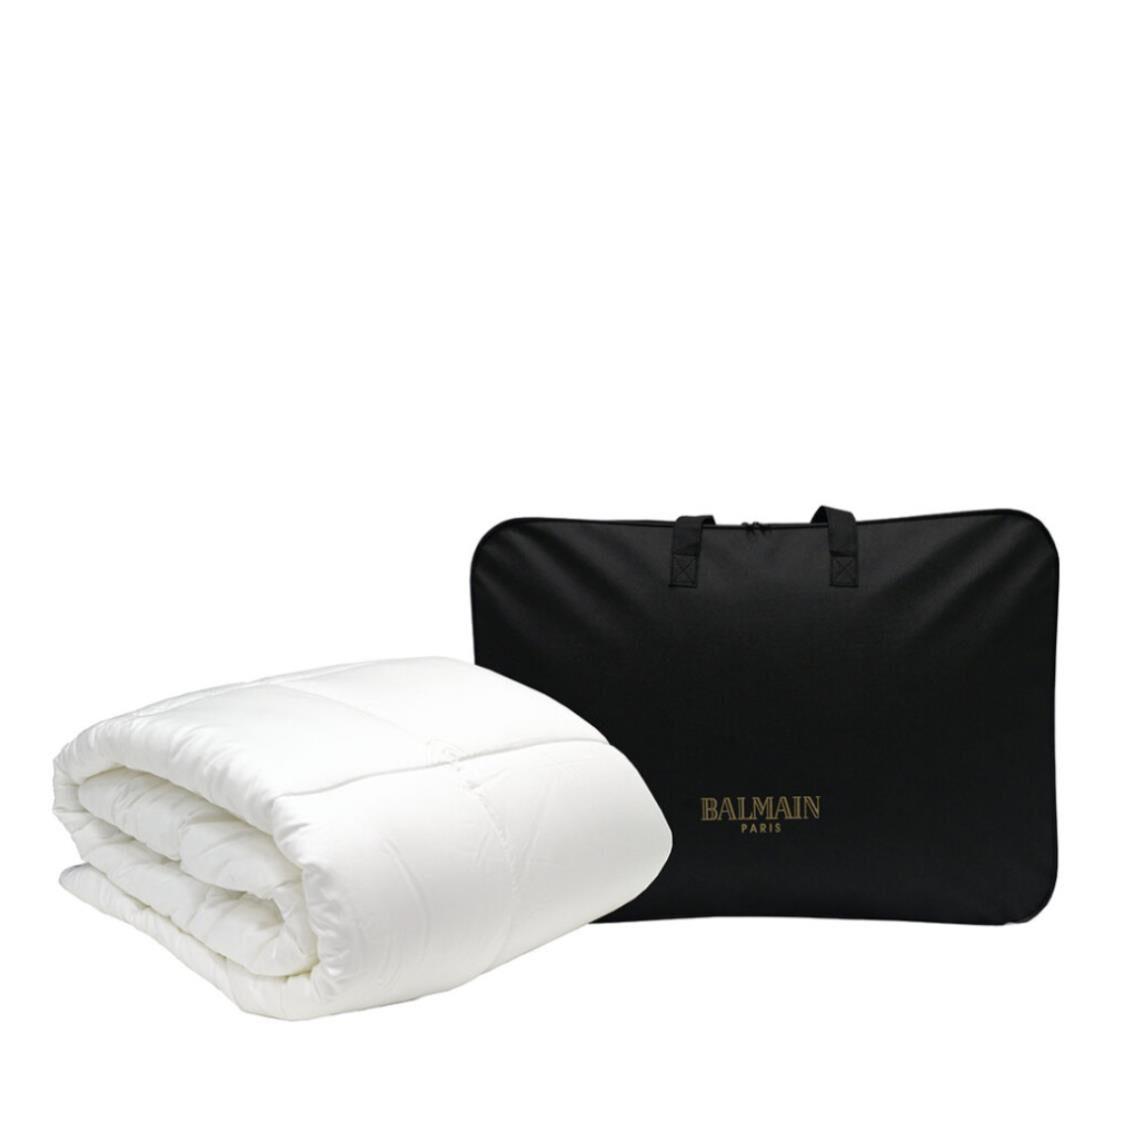 Balmain Special Edition Cotton Nanofil Quilt